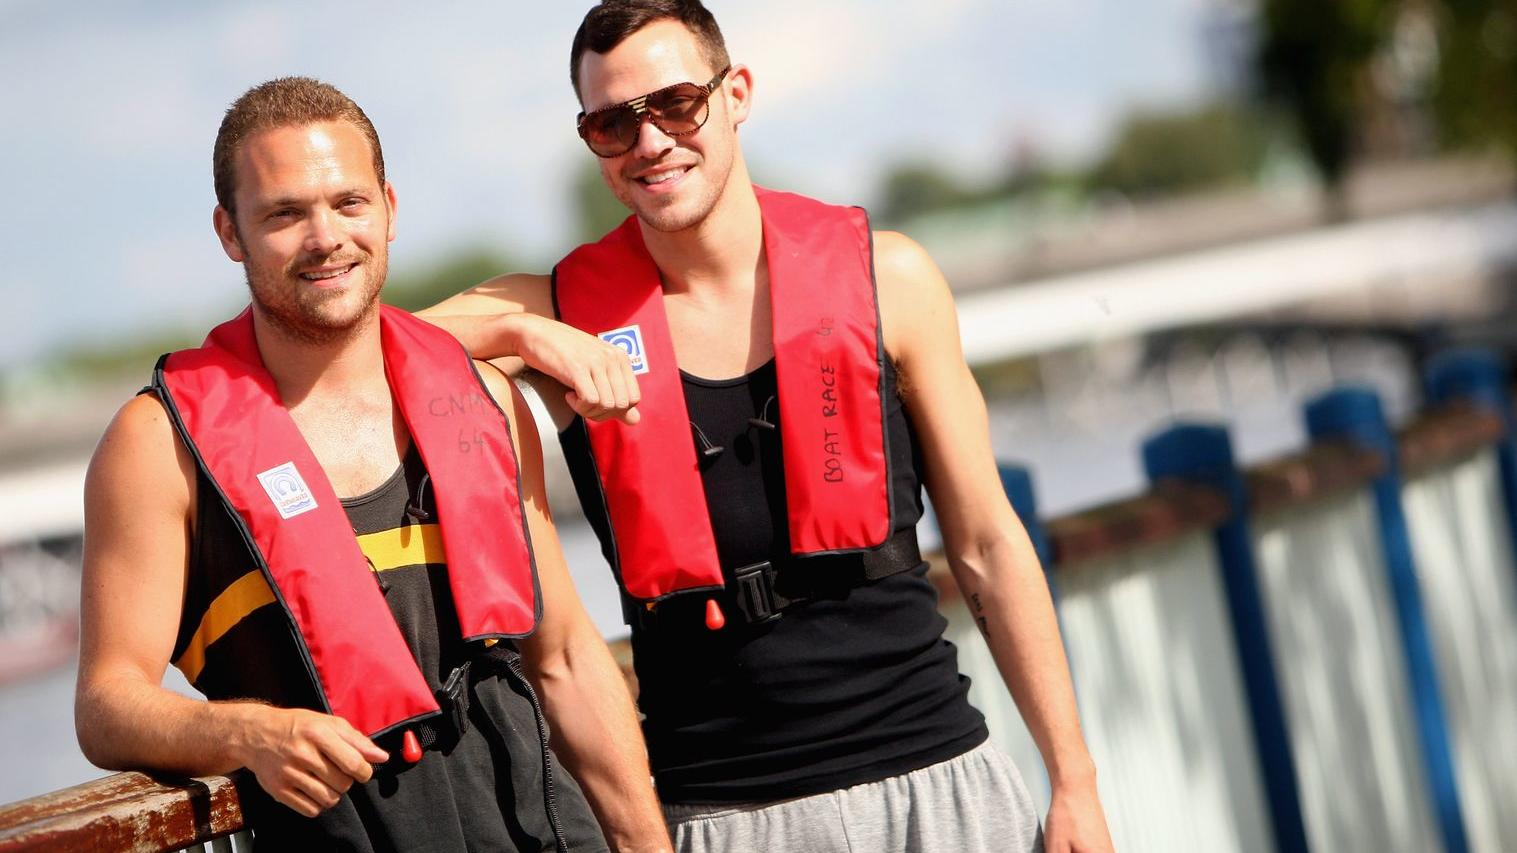 Zwillingsbrüder Rupert und Will Young